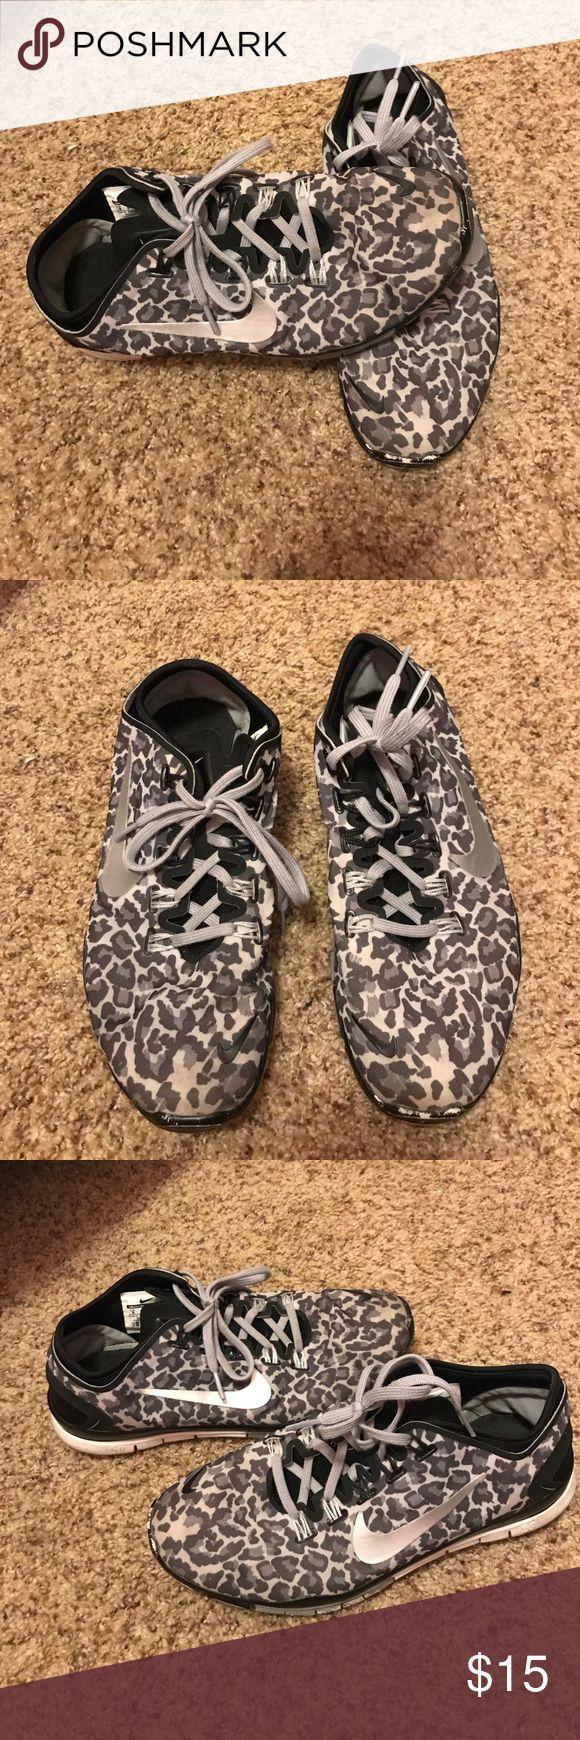 Nike cheetah shoes Worn shoes! Nike frees 5.0 Nike Shoes Sneakers